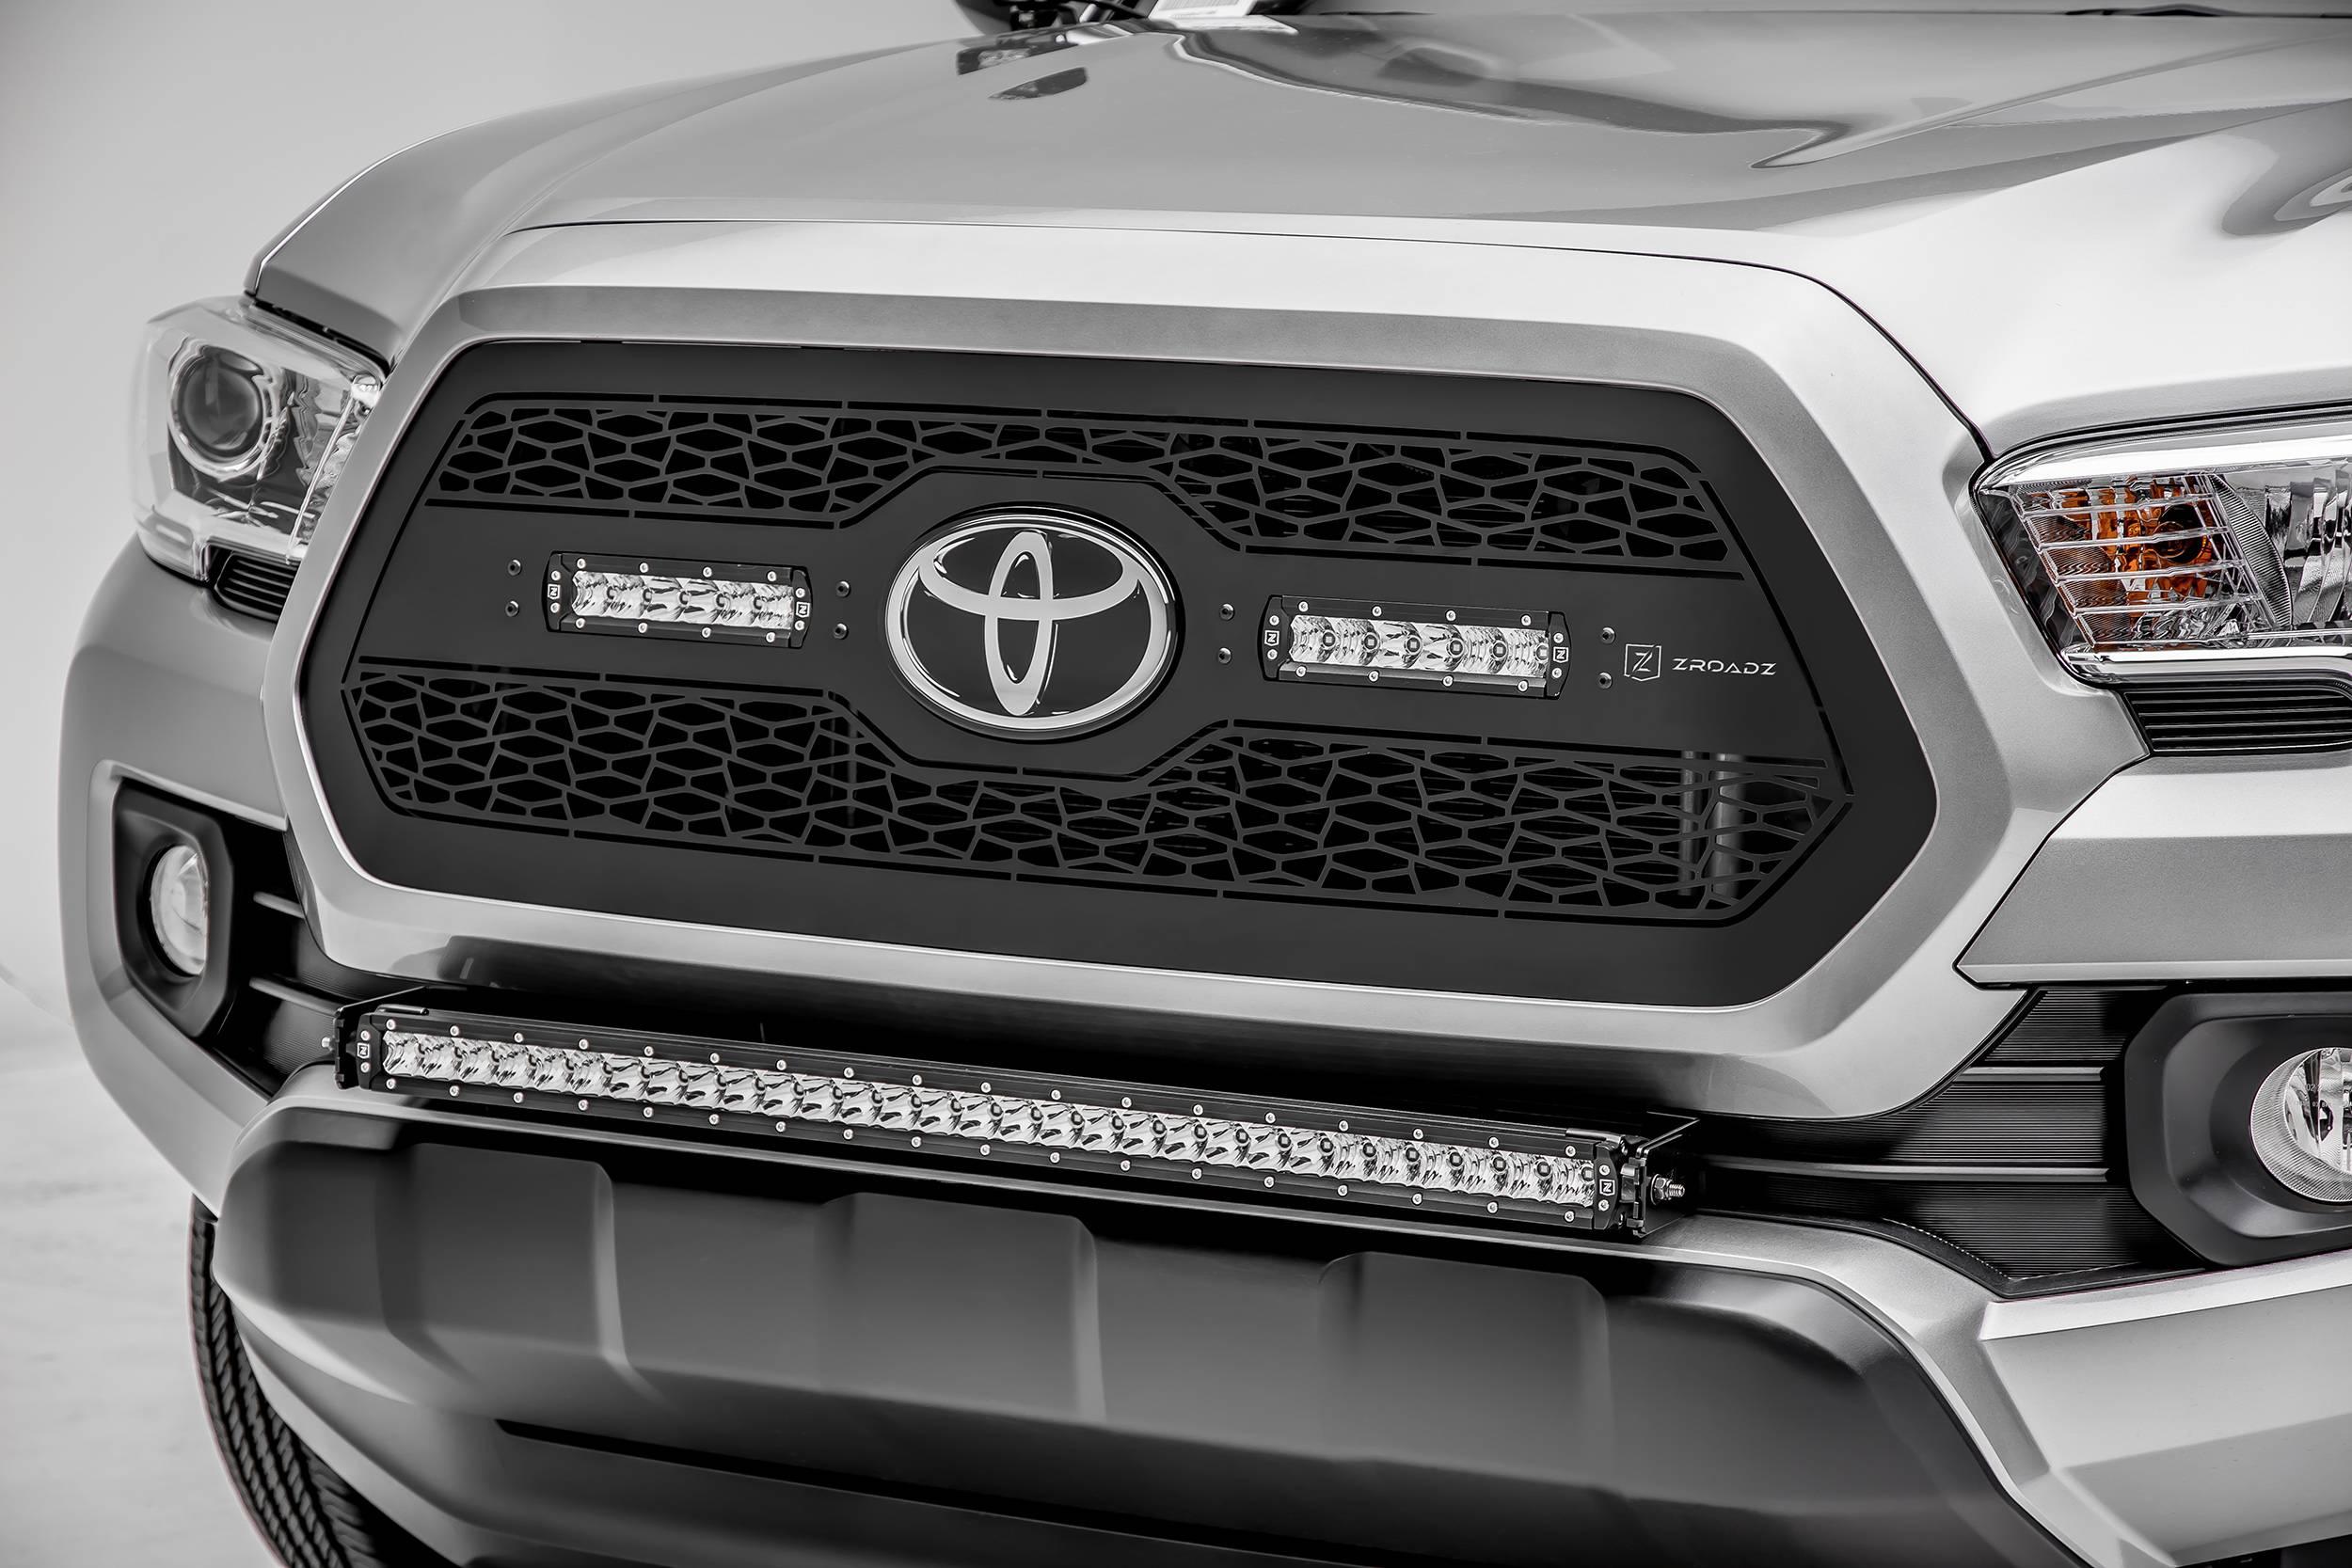 2018-2019 Toyota Tacoma Front Bumper Center LED Kit, Incl. (1) 30 Inch LED Straight Single Row Slim Light Bar - PN #Z329511-KIT-S